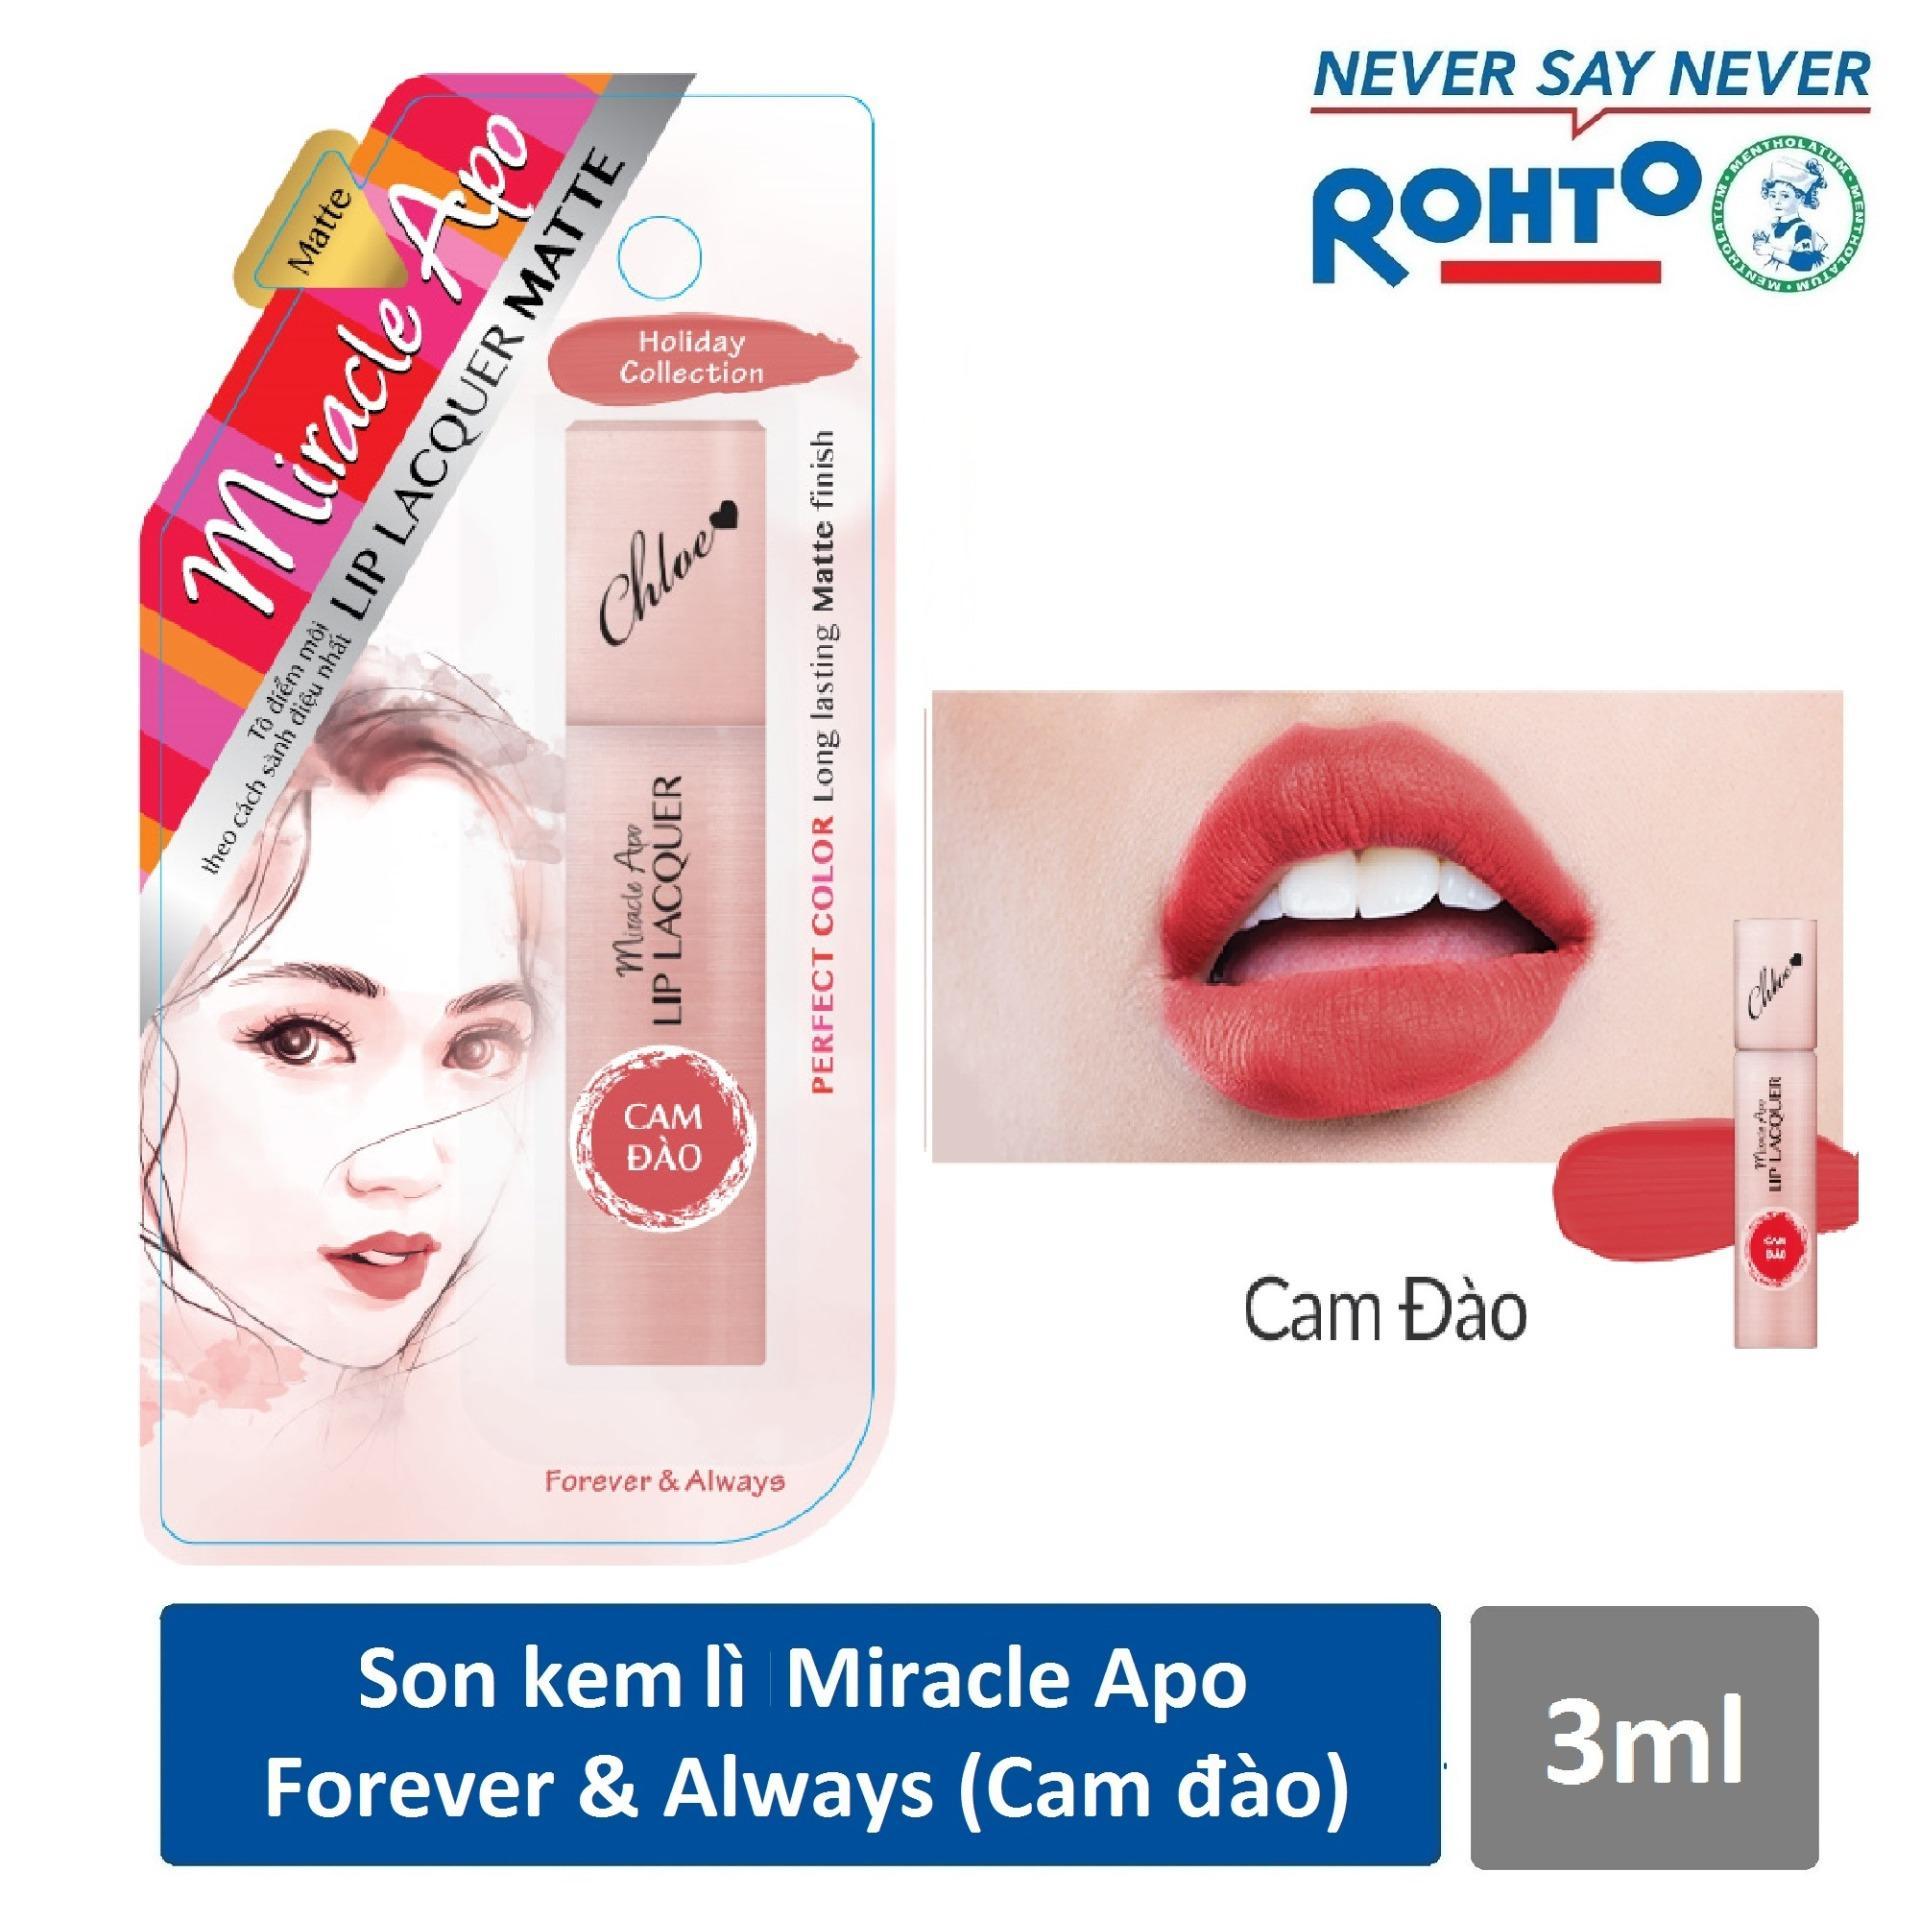 Hình ảnh Son kem lì Miracle Apo Lip Lacquer Matte Holiday Collection Forever & Always 3ml (Cam đào)